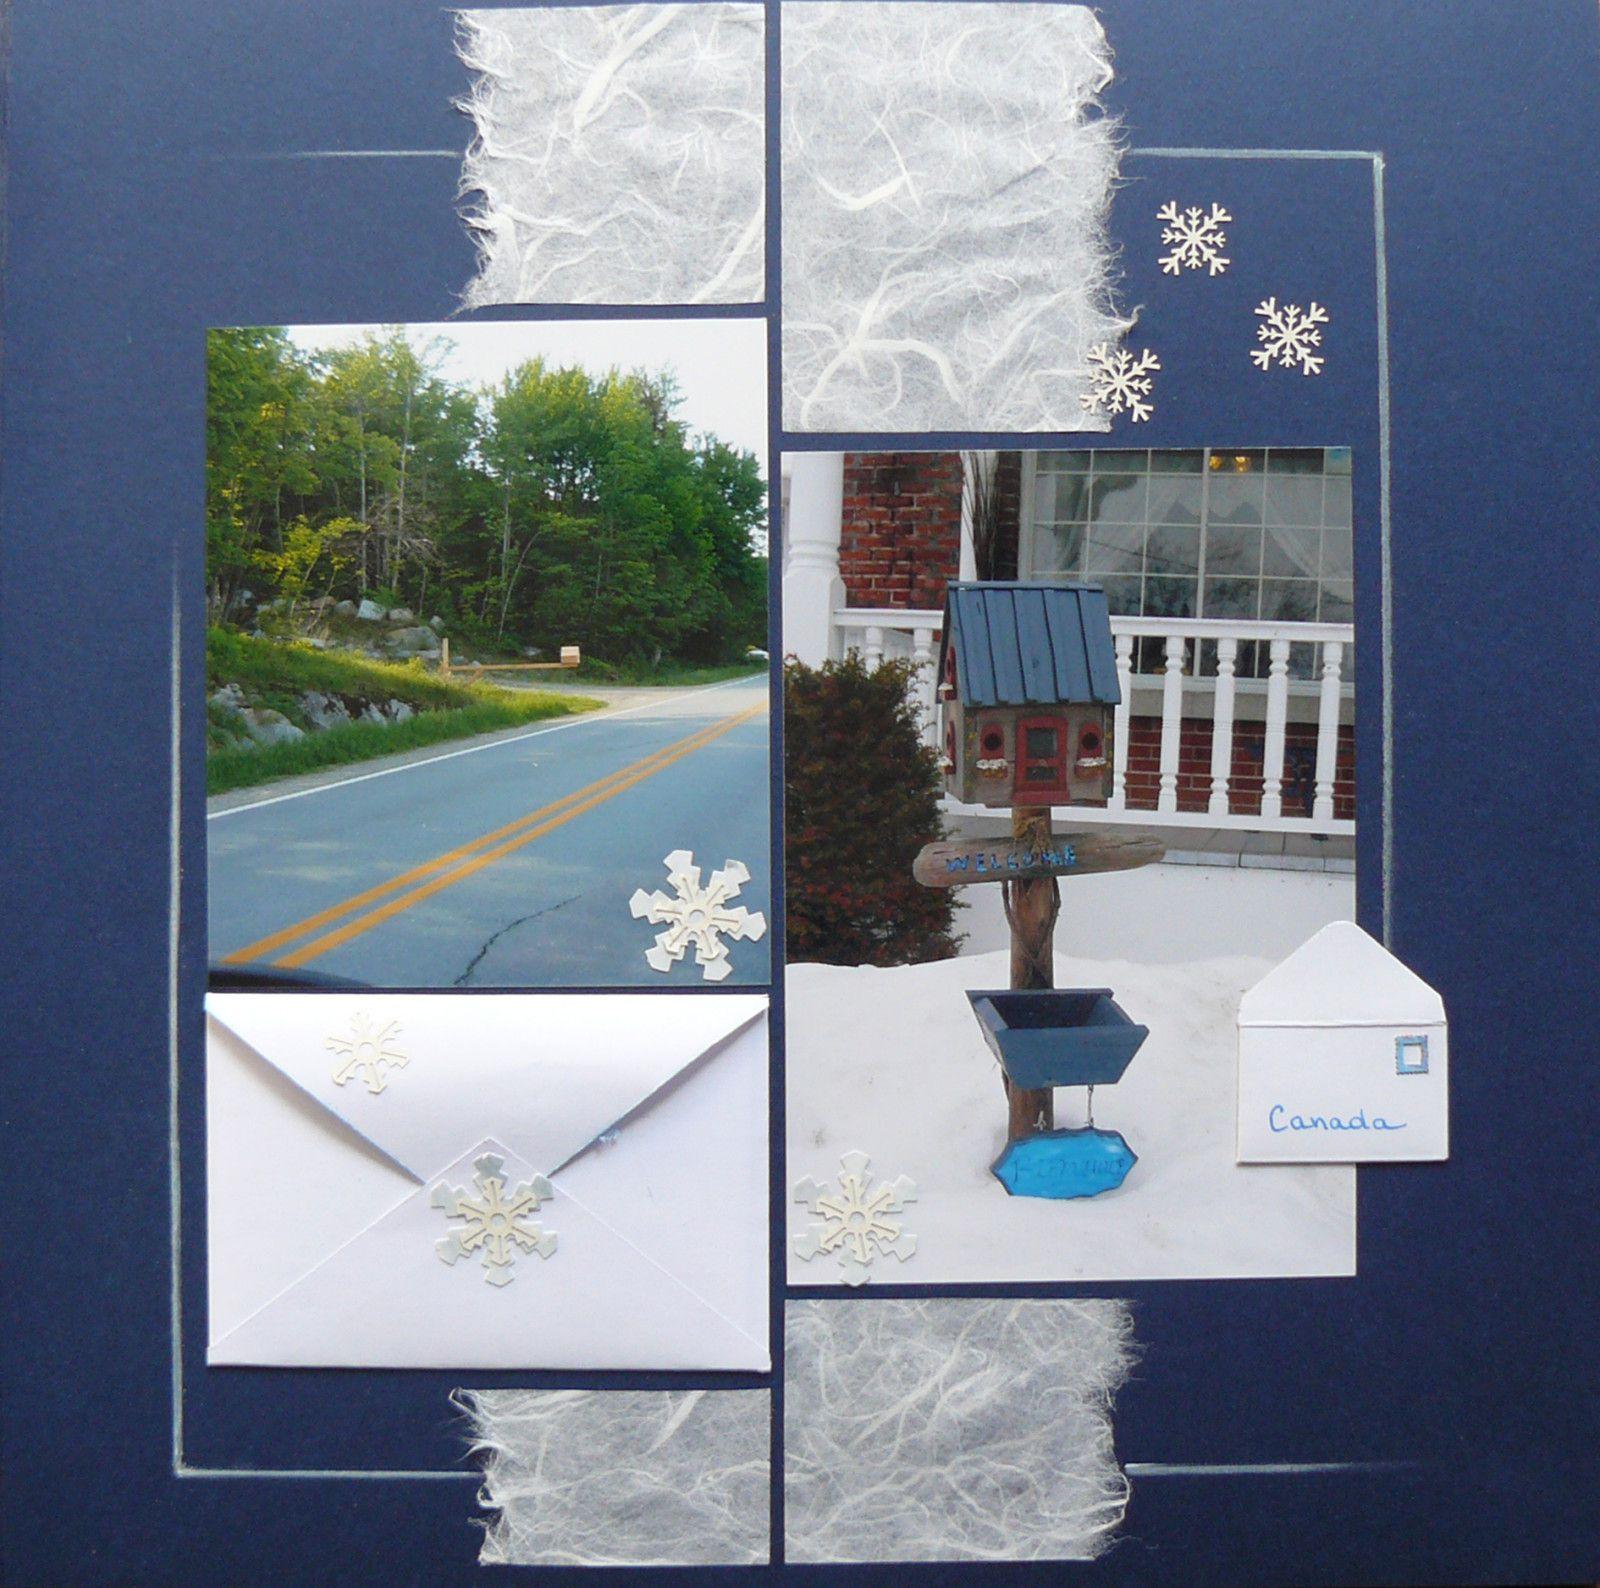 Canada :boîtes aux lettres